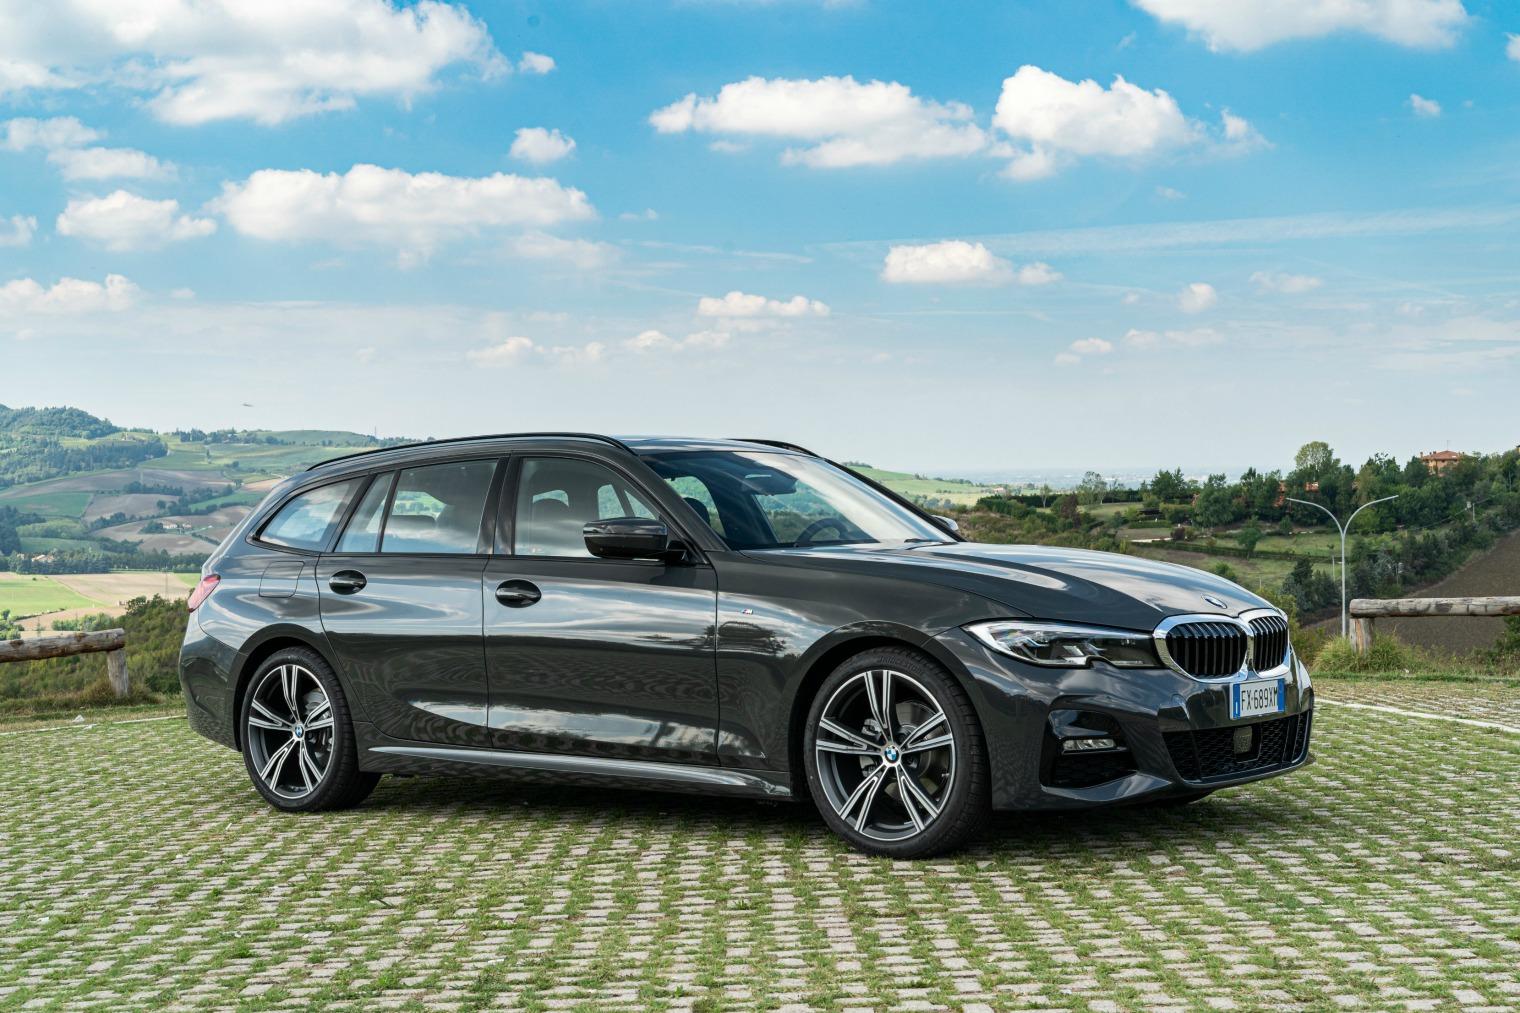 Allestimenti nuova BMW Serie 3 Touring